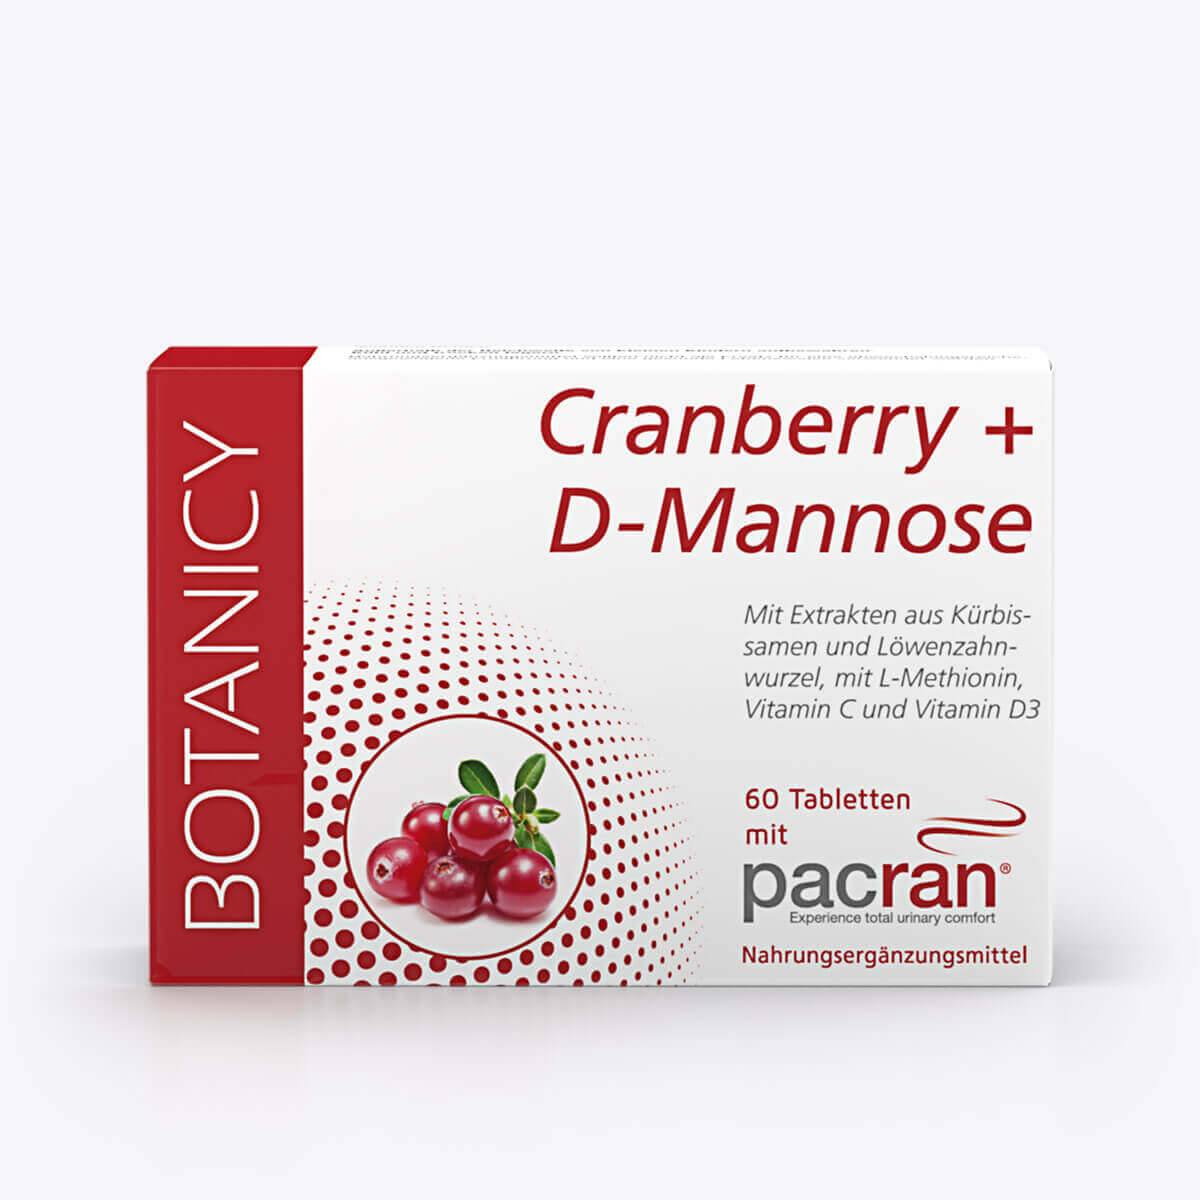 CRANBERRY + D-MANNOSE